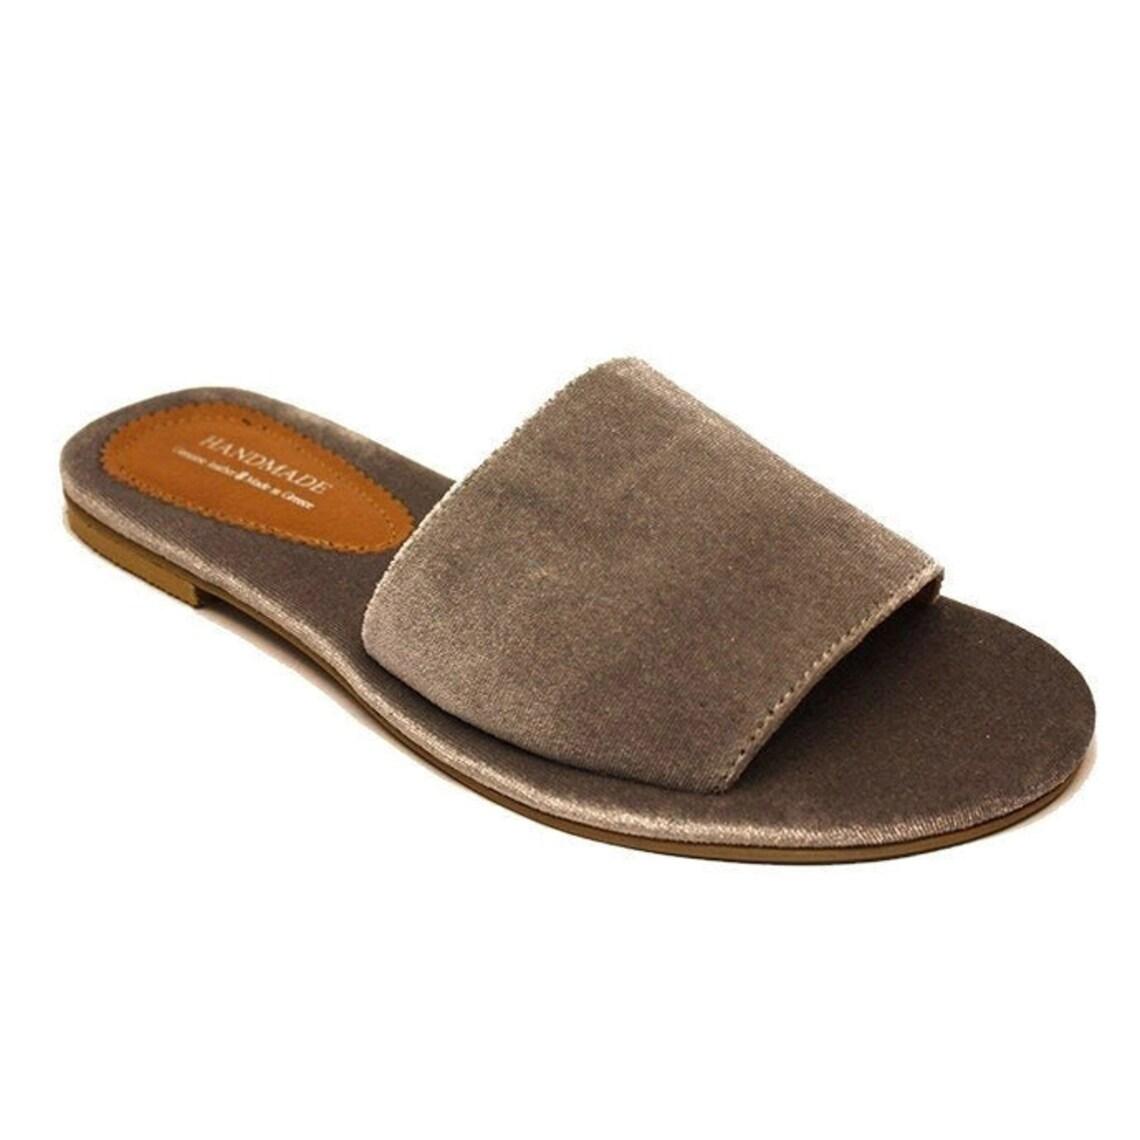 Luxury Velvet Anatomic Non Slippery Handmade Greek Sandals - Big Sale bts2Q